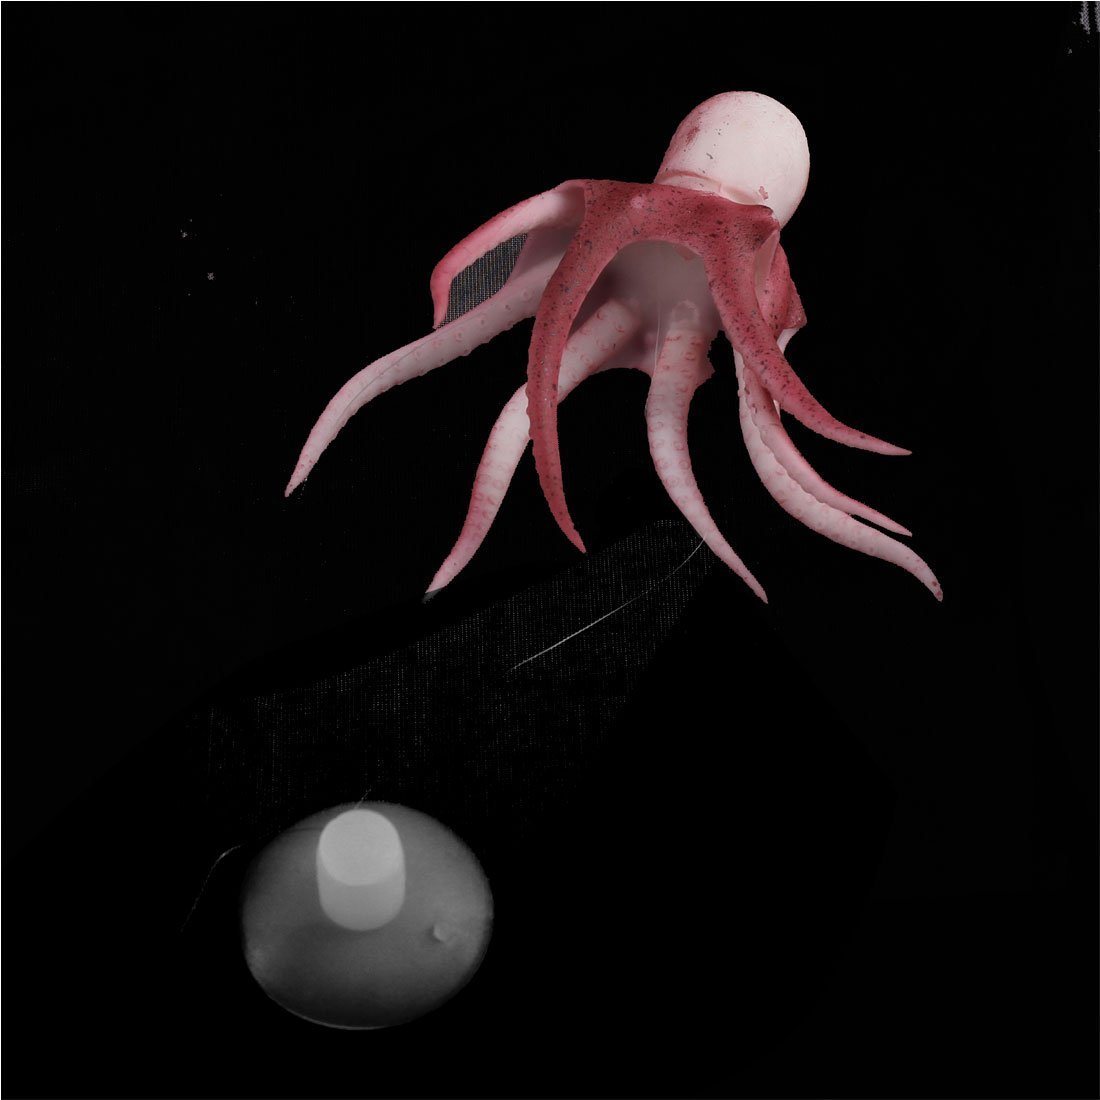 Amazon.com: Acuario de medusas emulational Suave Rojo del ornamento: Pet Supplies